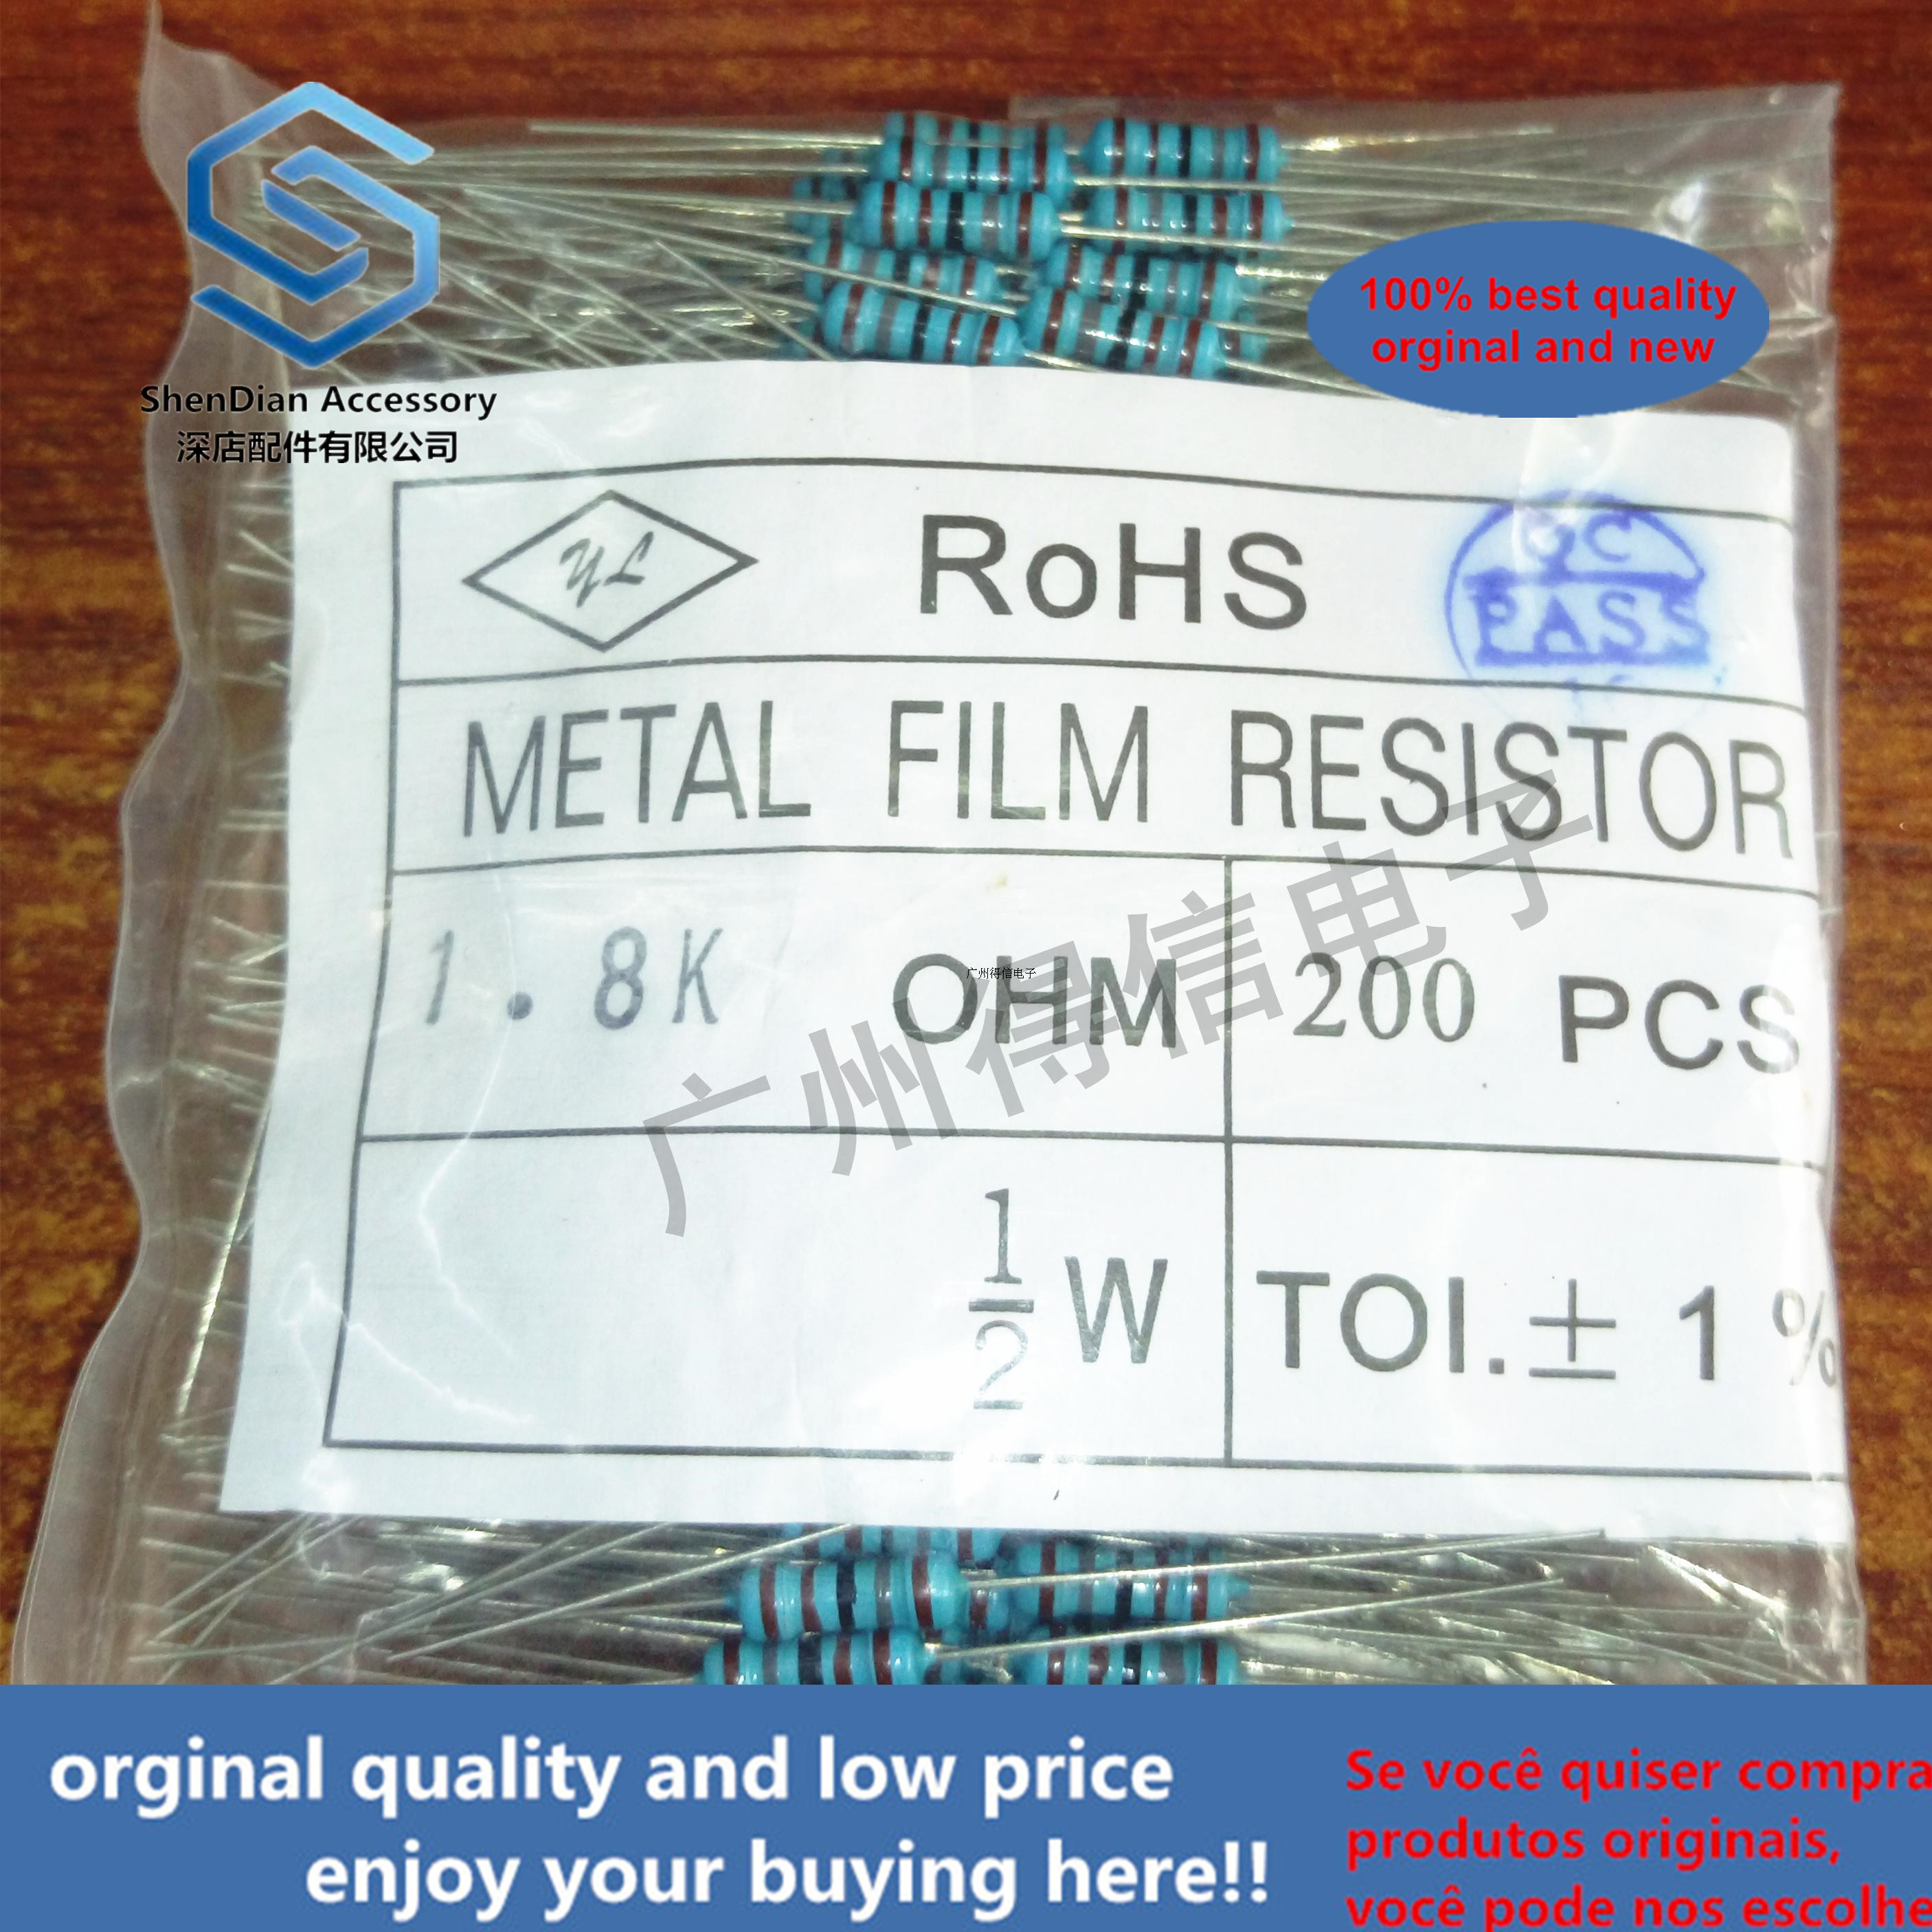 200pcs 1 / 2W 24R 24Euro 1% Brand New Metal Film Iron Foot Resistance Bag 200pcs Per Pack